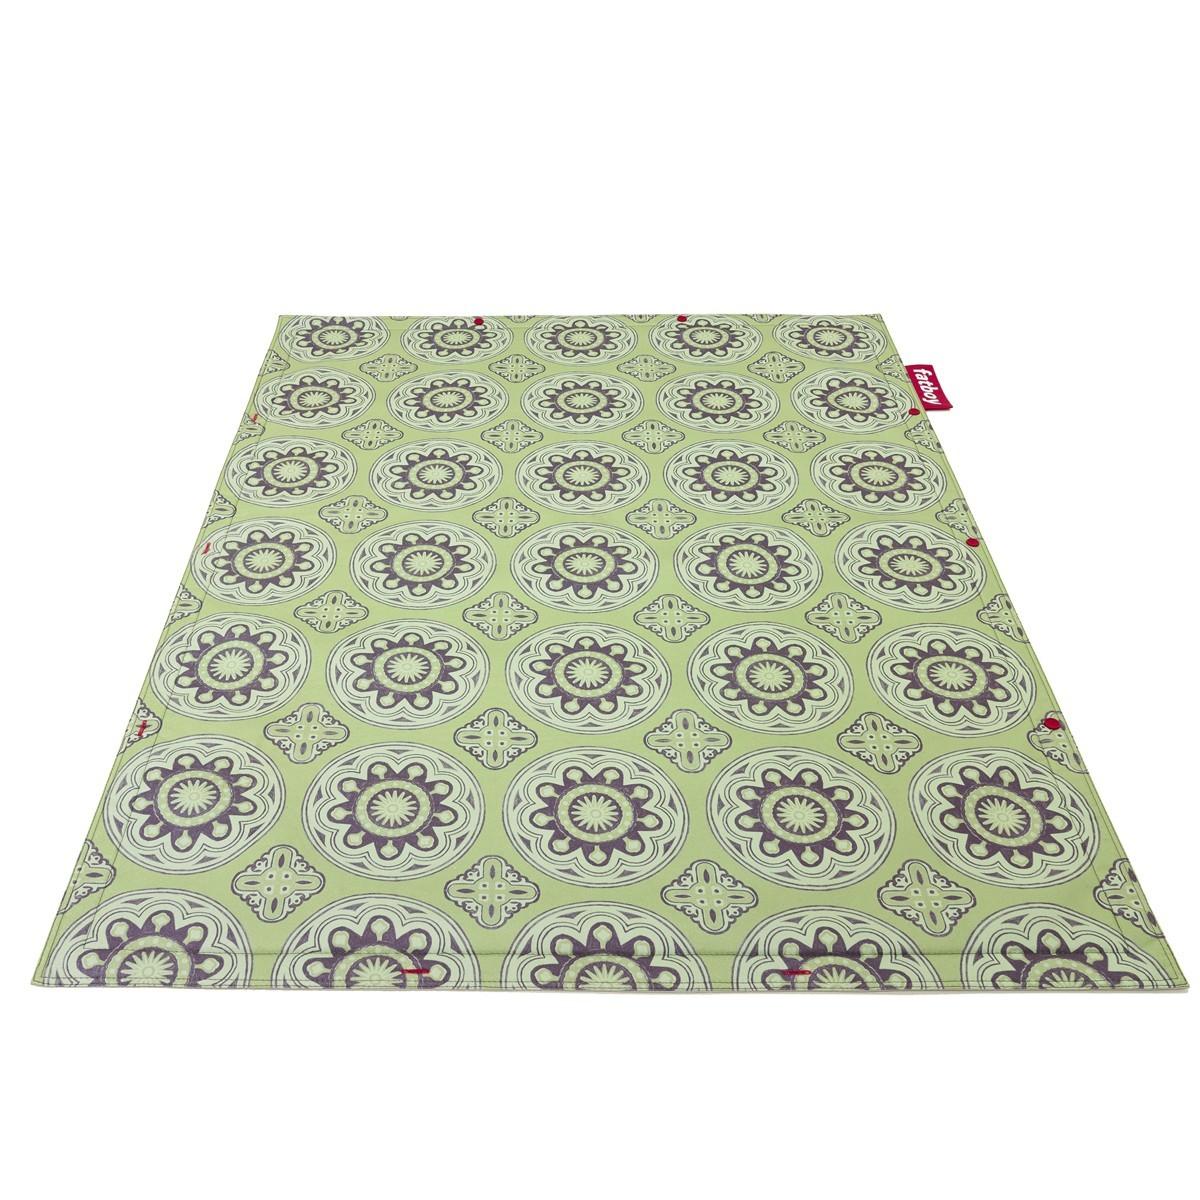 Fatboy Flying Carpet vloerkleed-Casablanca groen